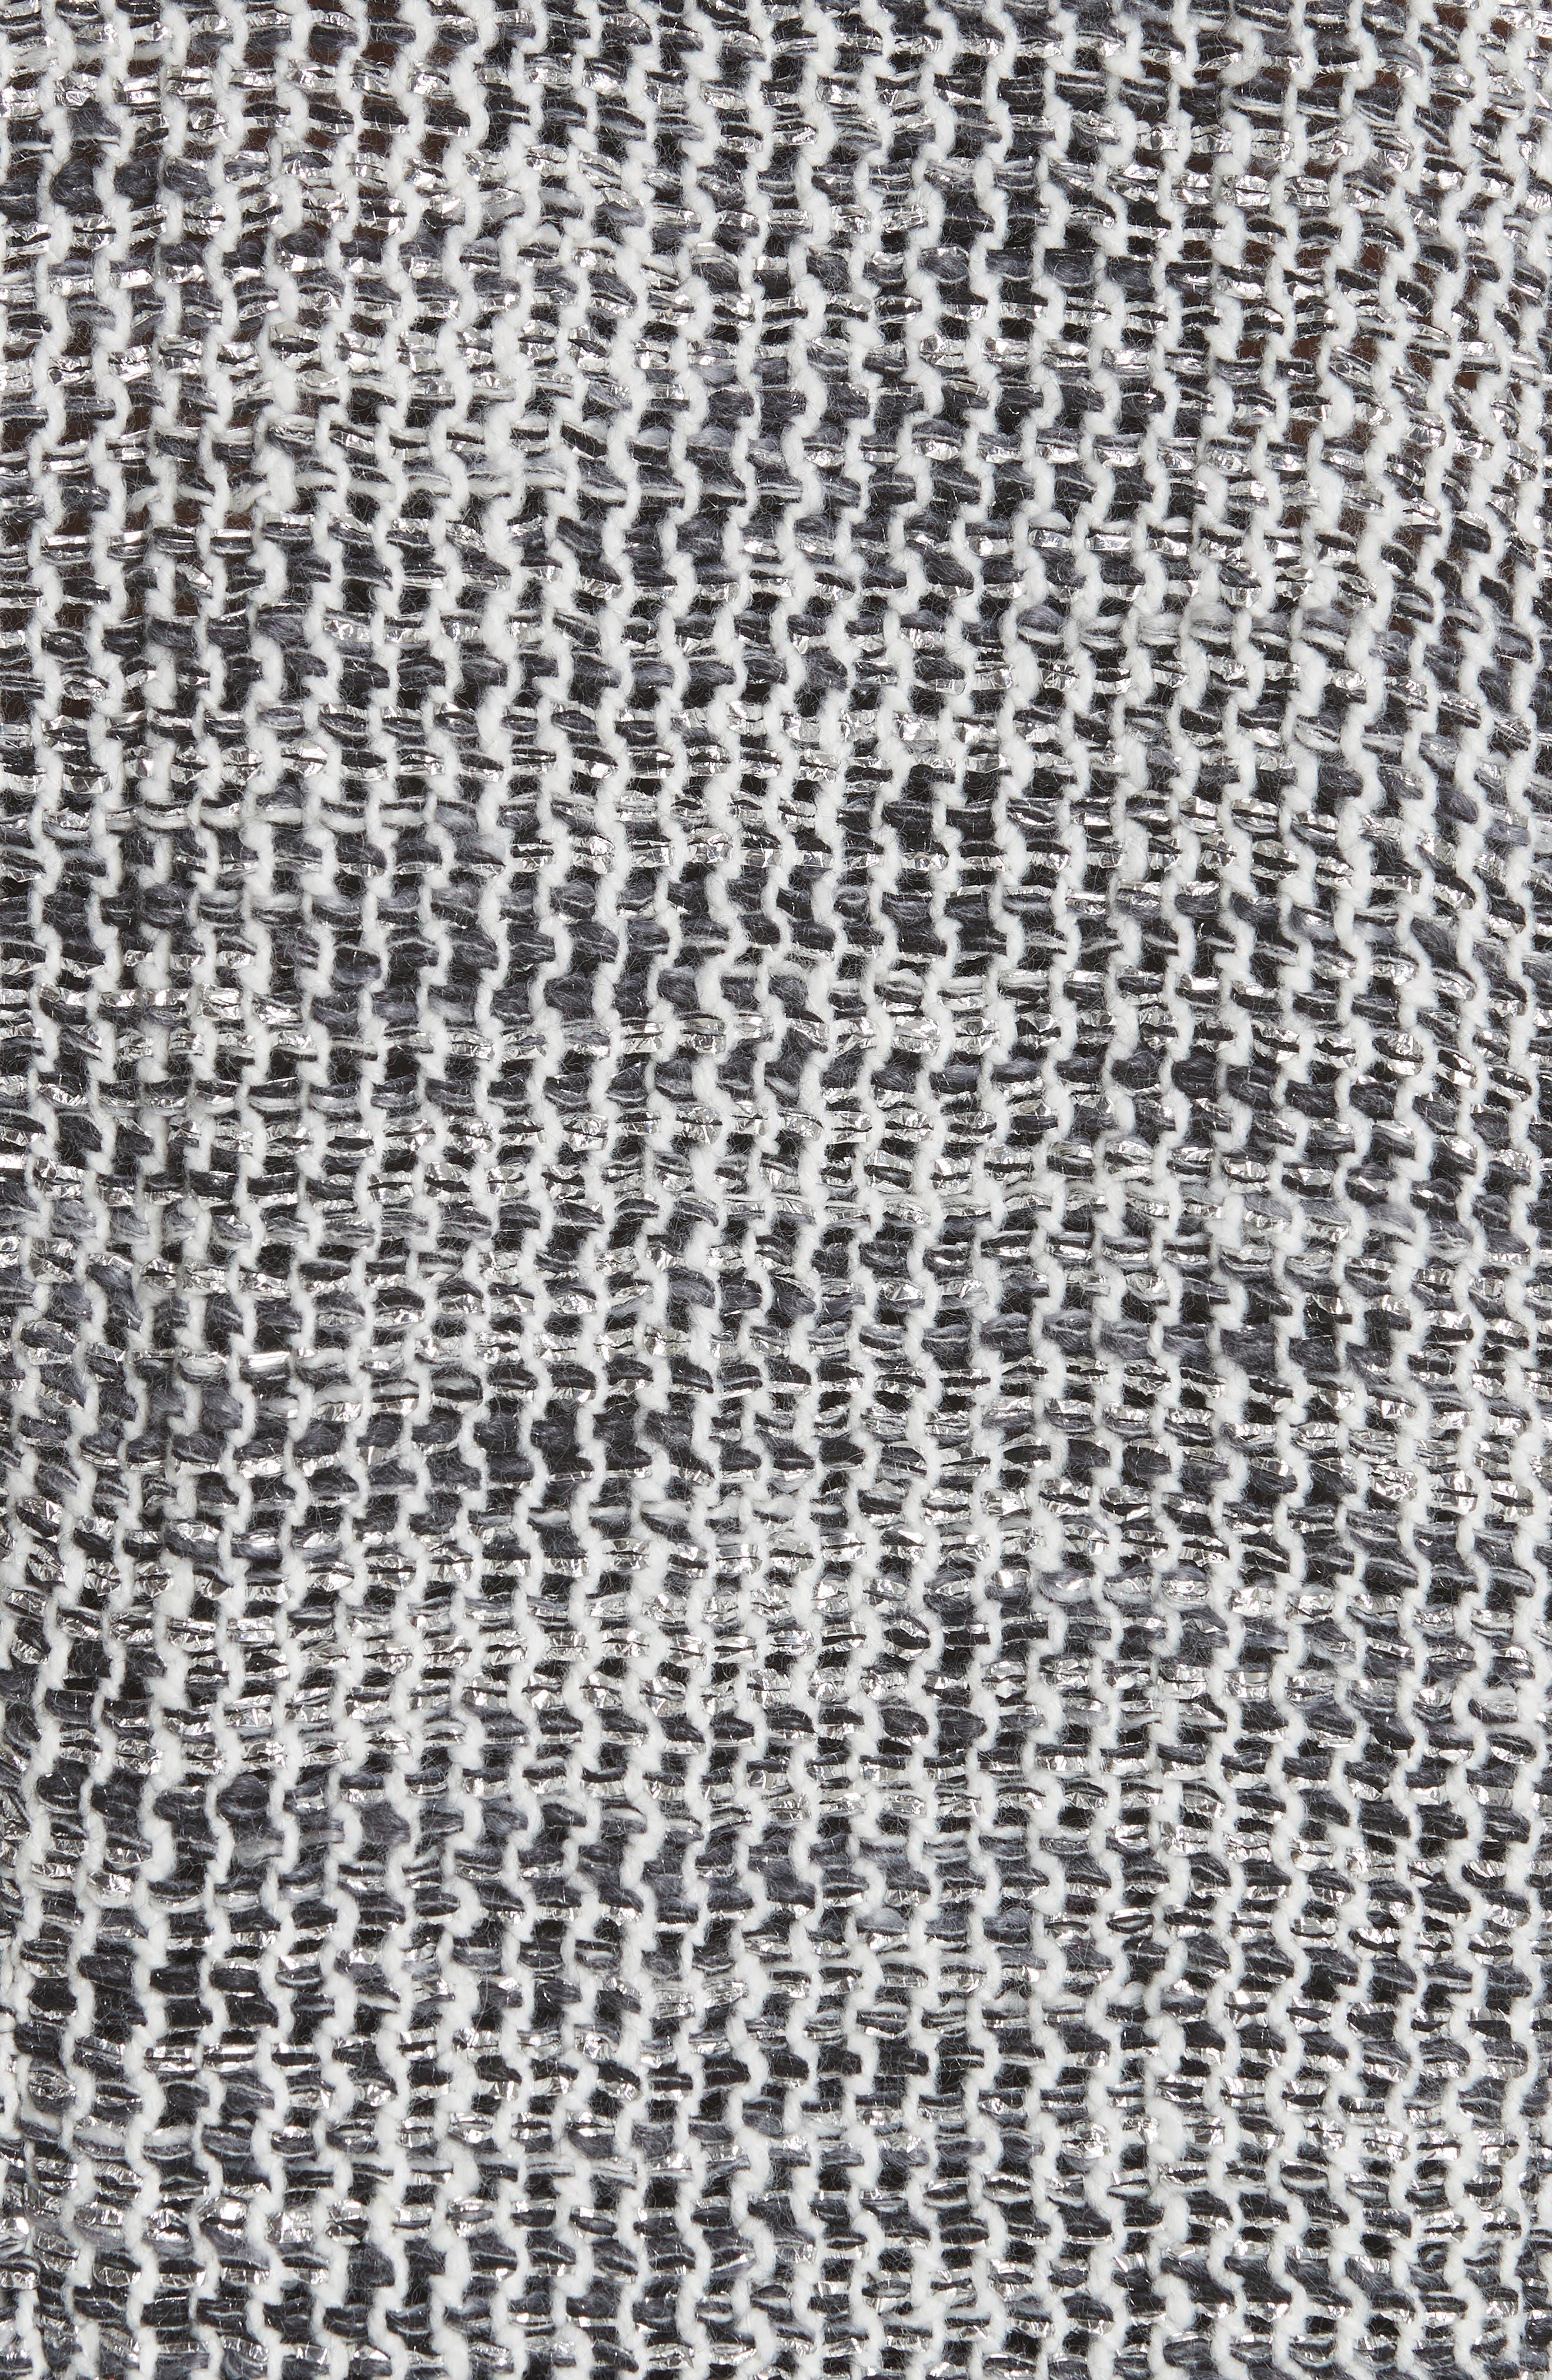 Unplug Metallic Tweed Jacket,                             Alternate thumbnail 6, color,                             GREY